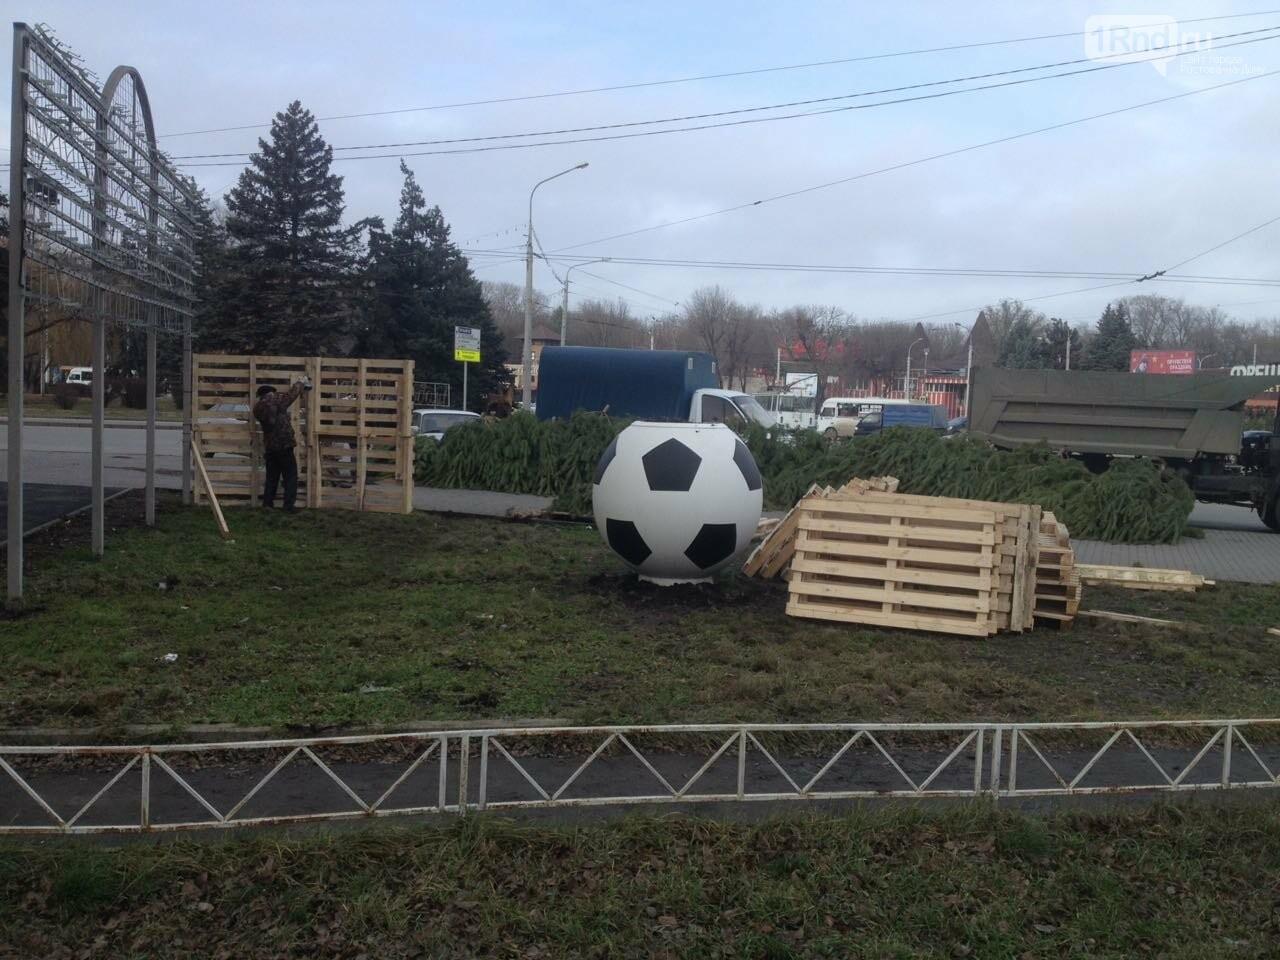 Фото: пресс-служба мэрии Ростова